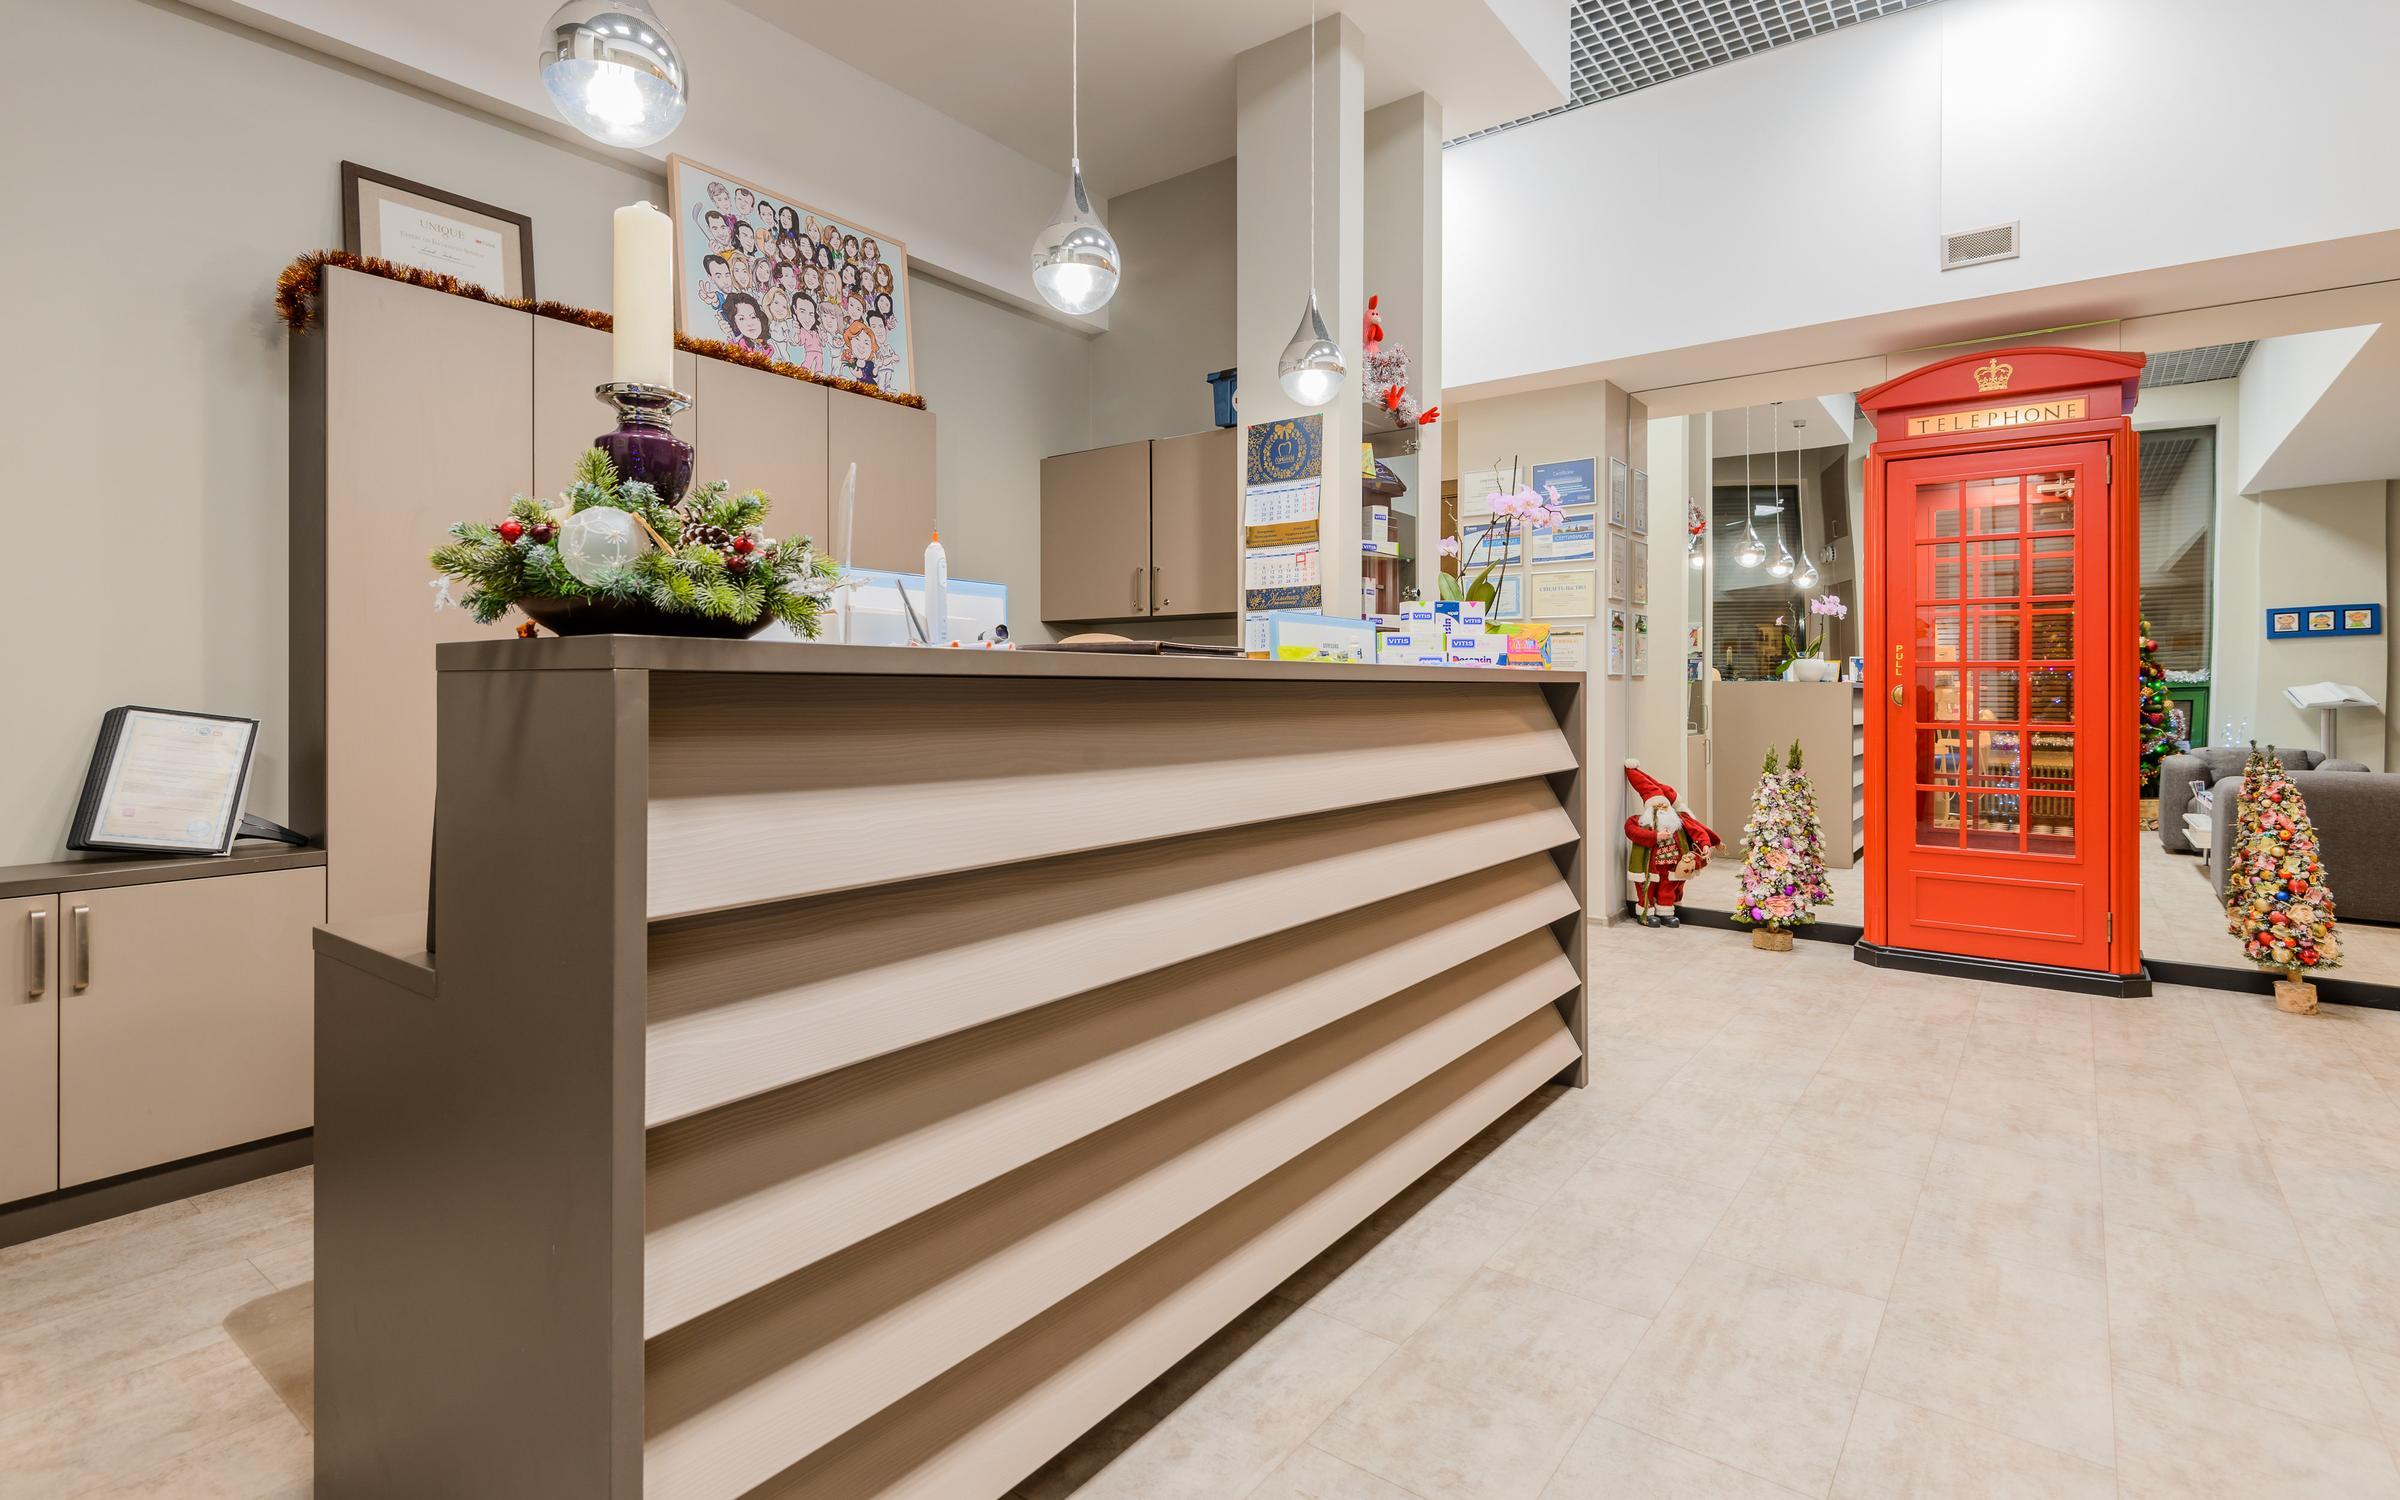 фотография Ортодонтической студии Леонида Горбунова на метро Озерки